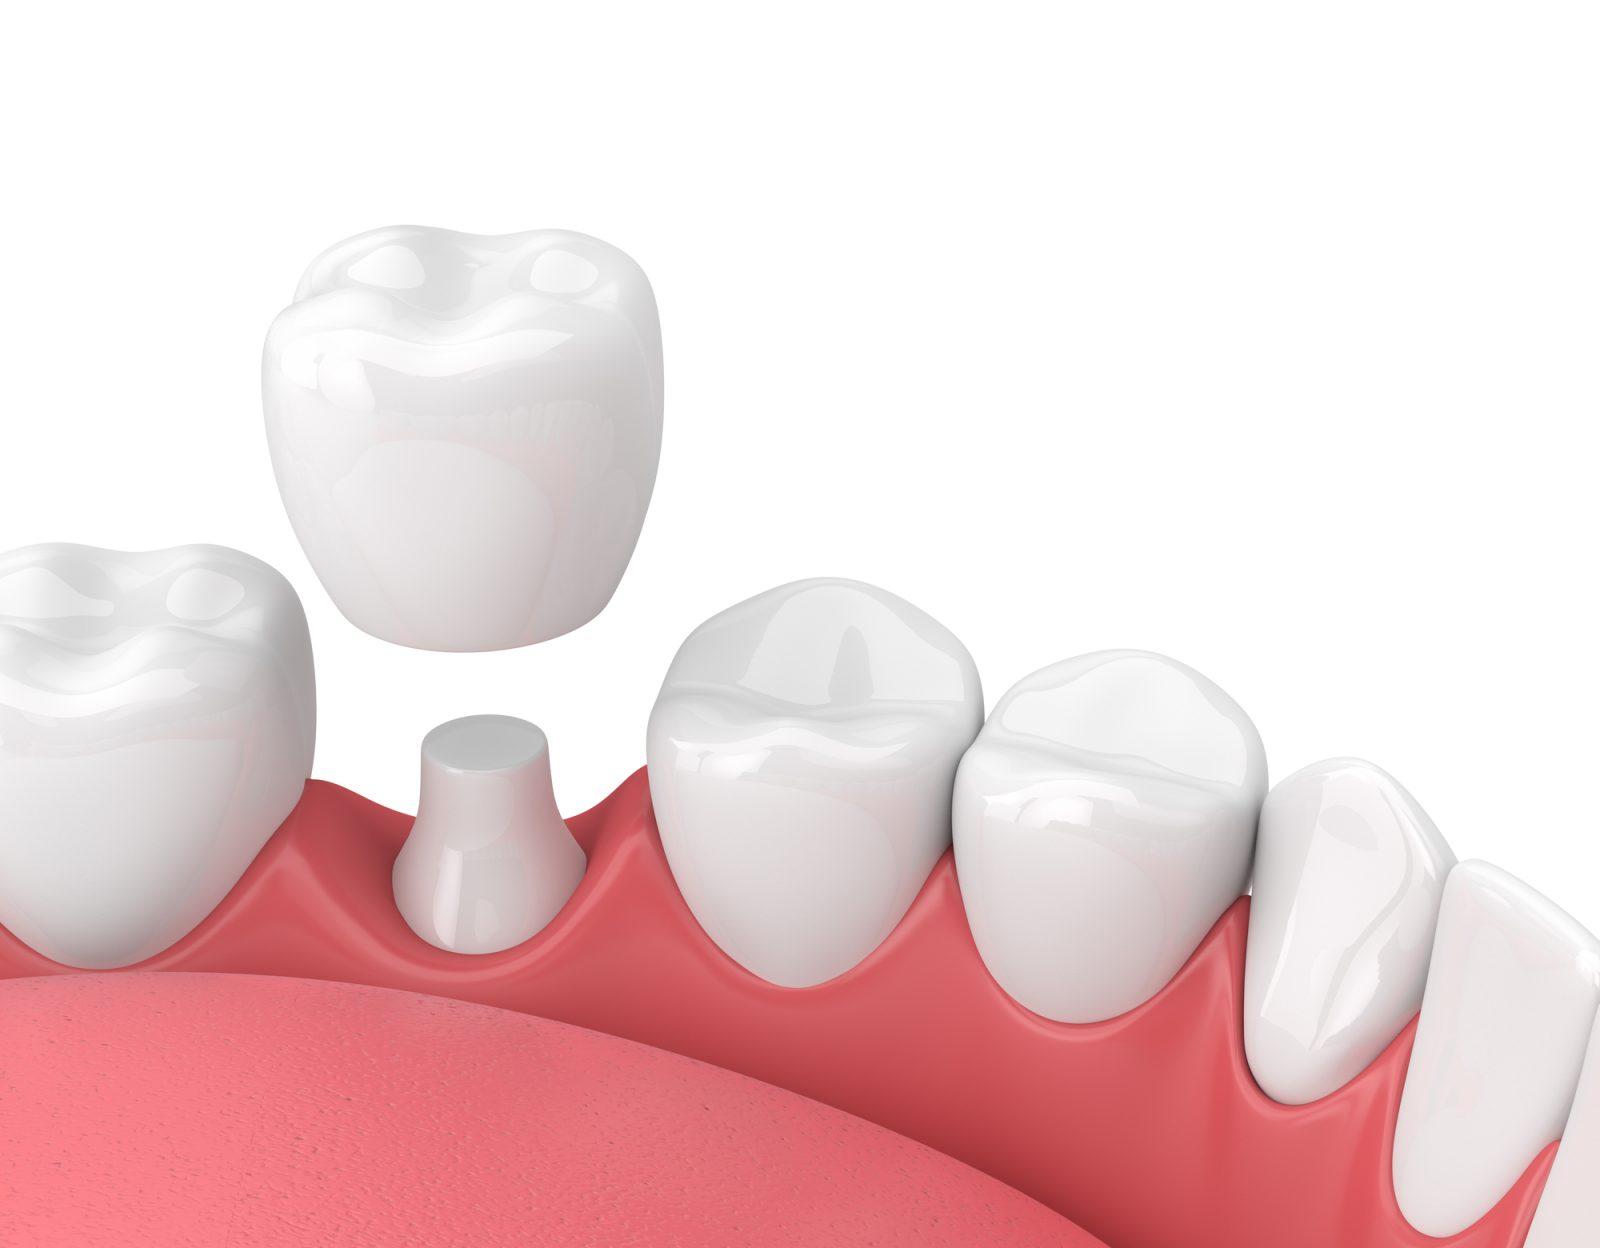 Implant dentaire : un dentiste mène la chirurgie ?